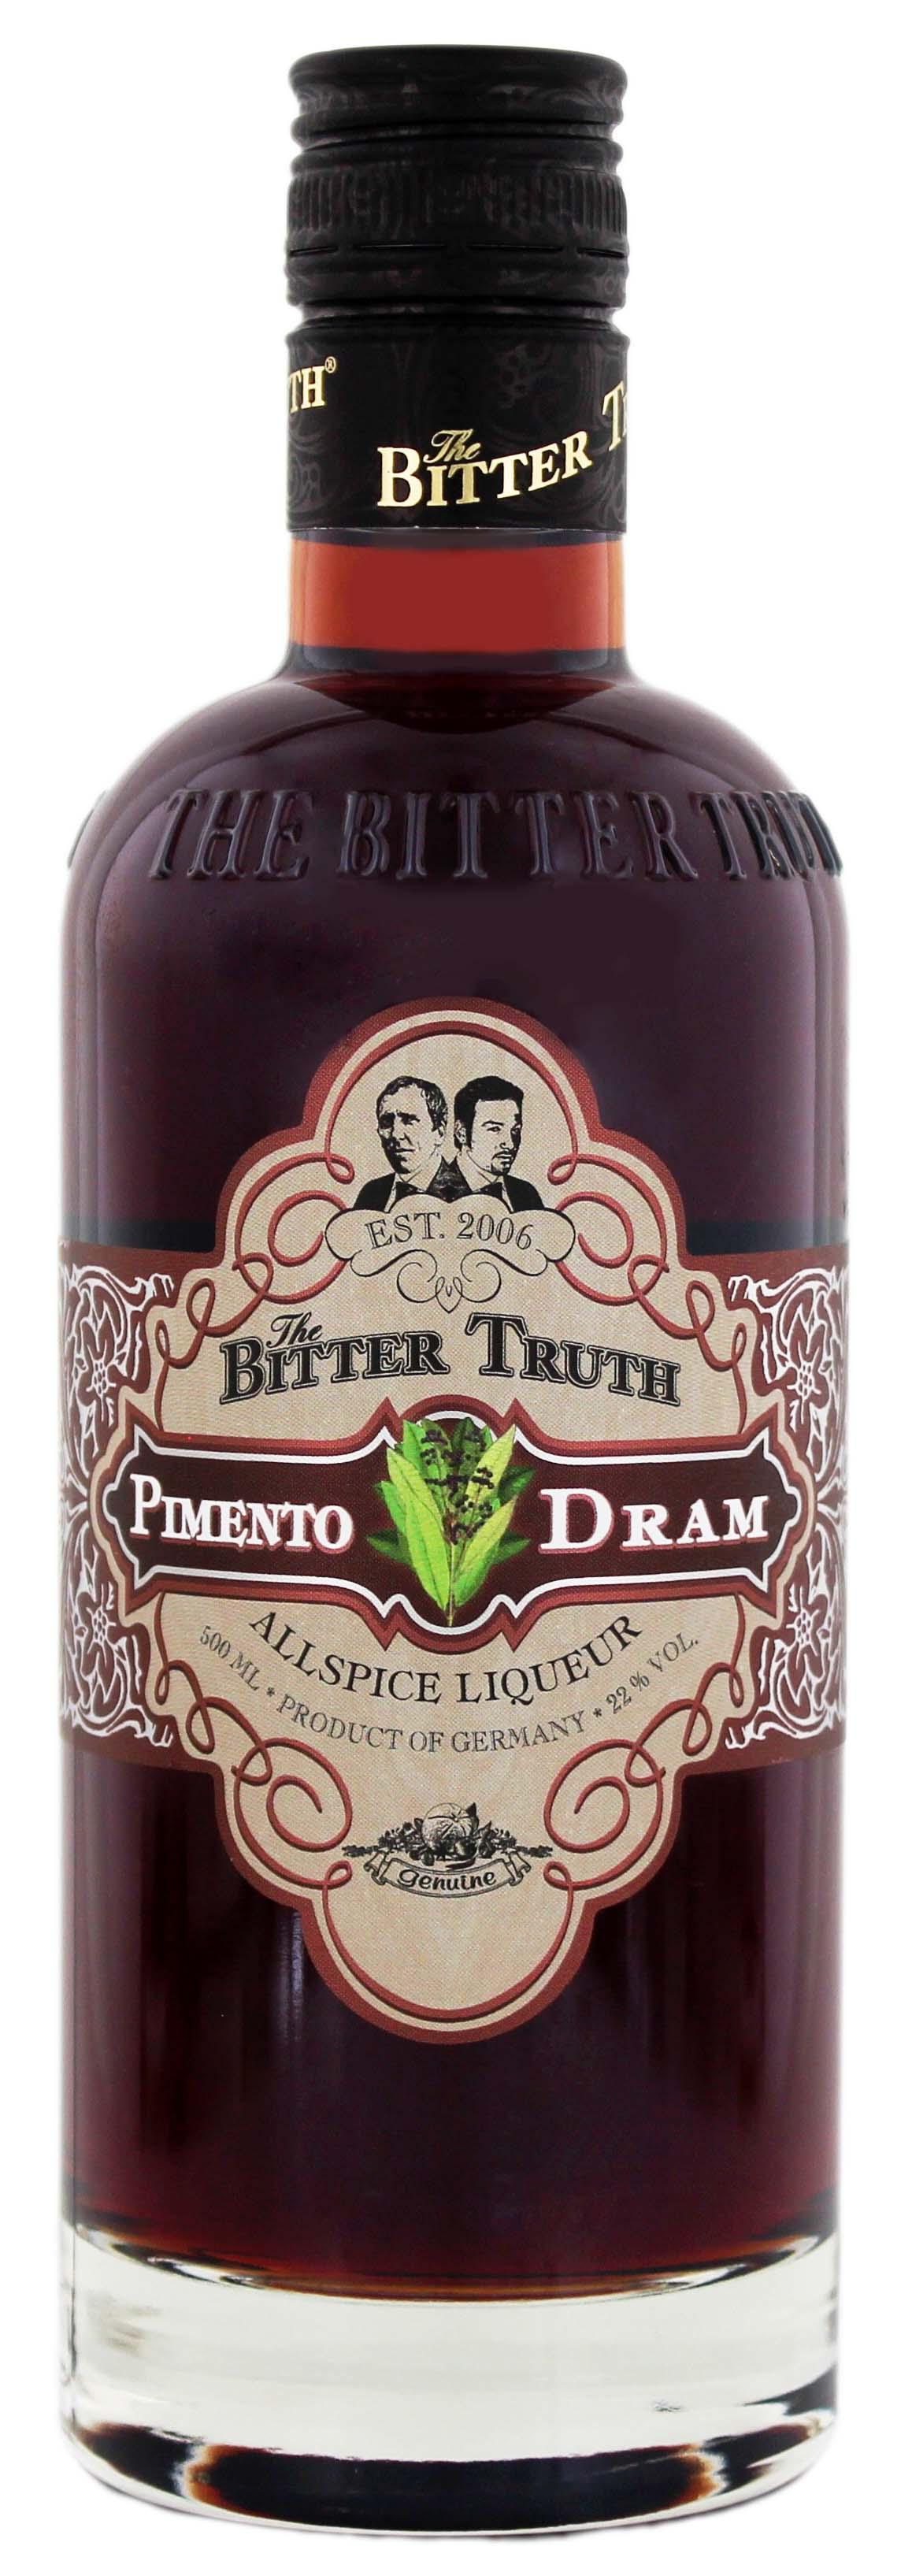 The Bitter Truth Pimento Dram 0,5L